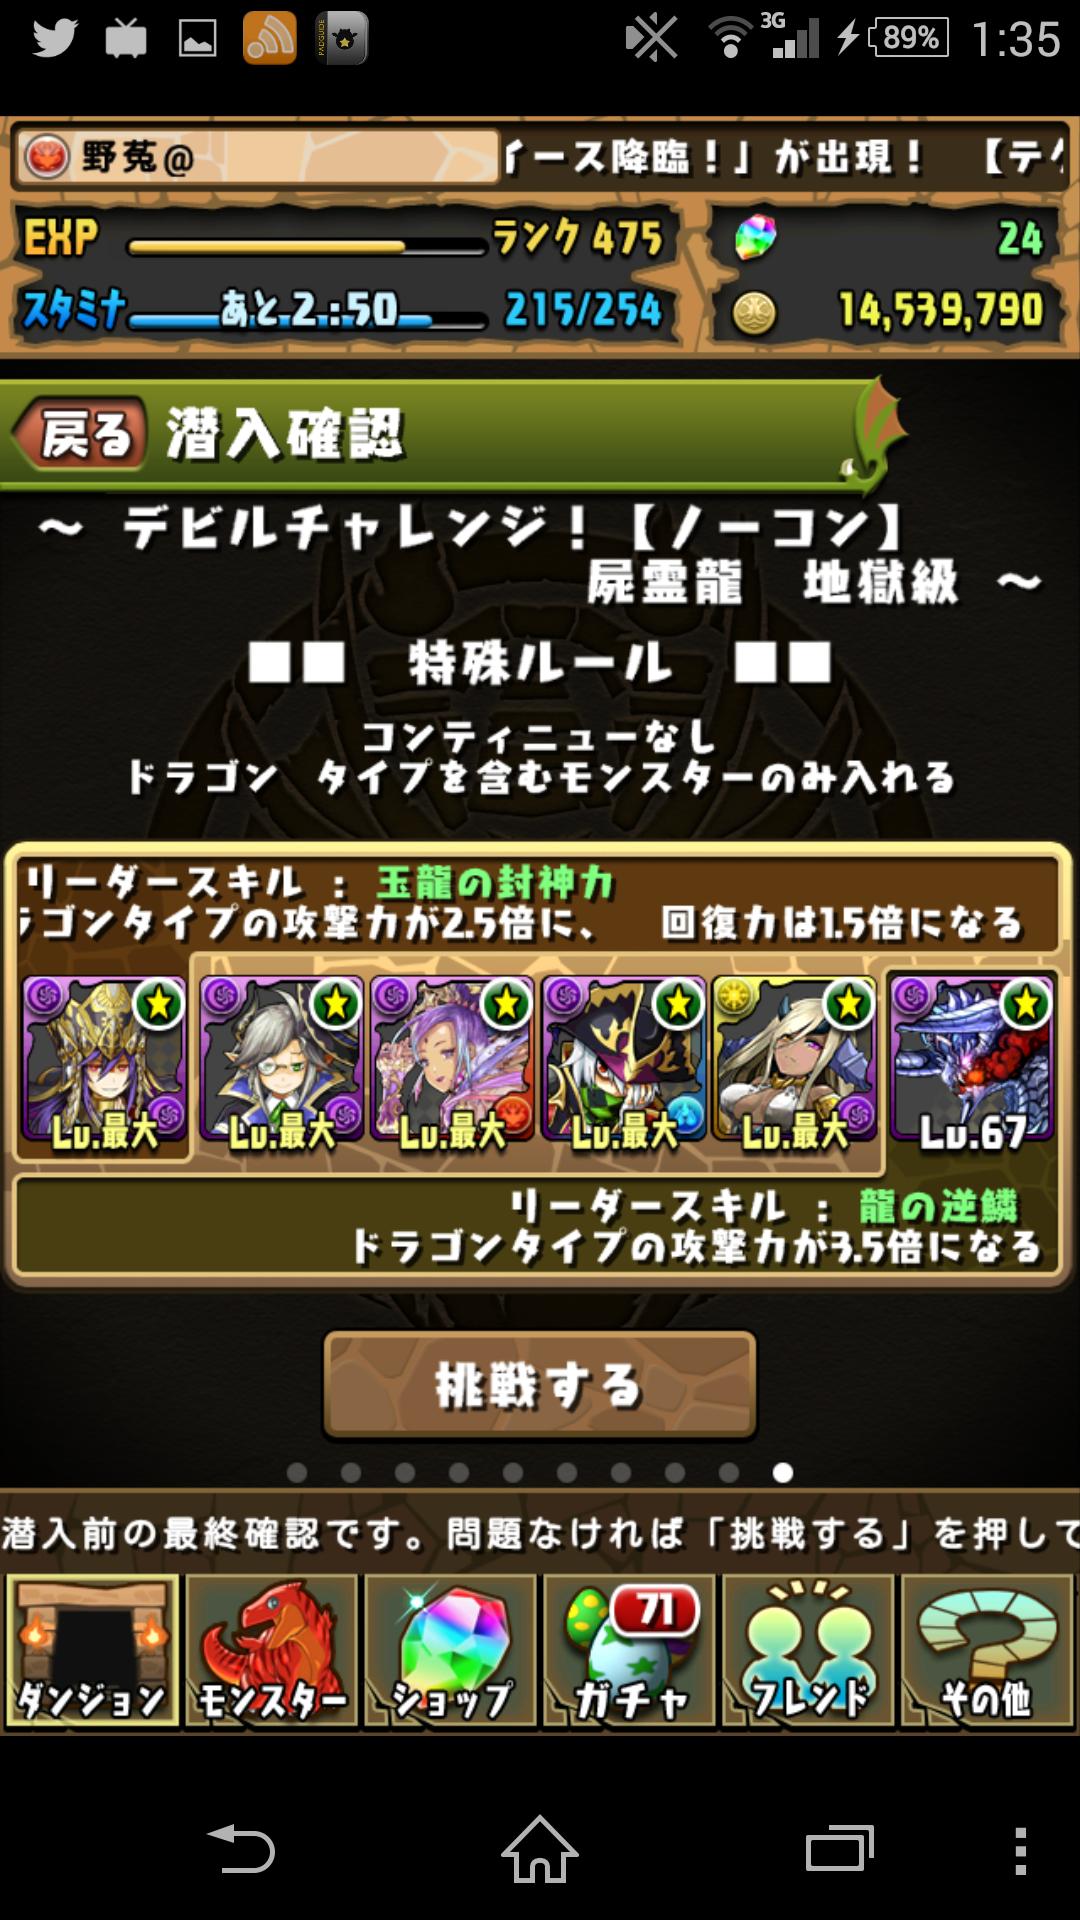 Screenshot_2015-03-04-01-35-23.png